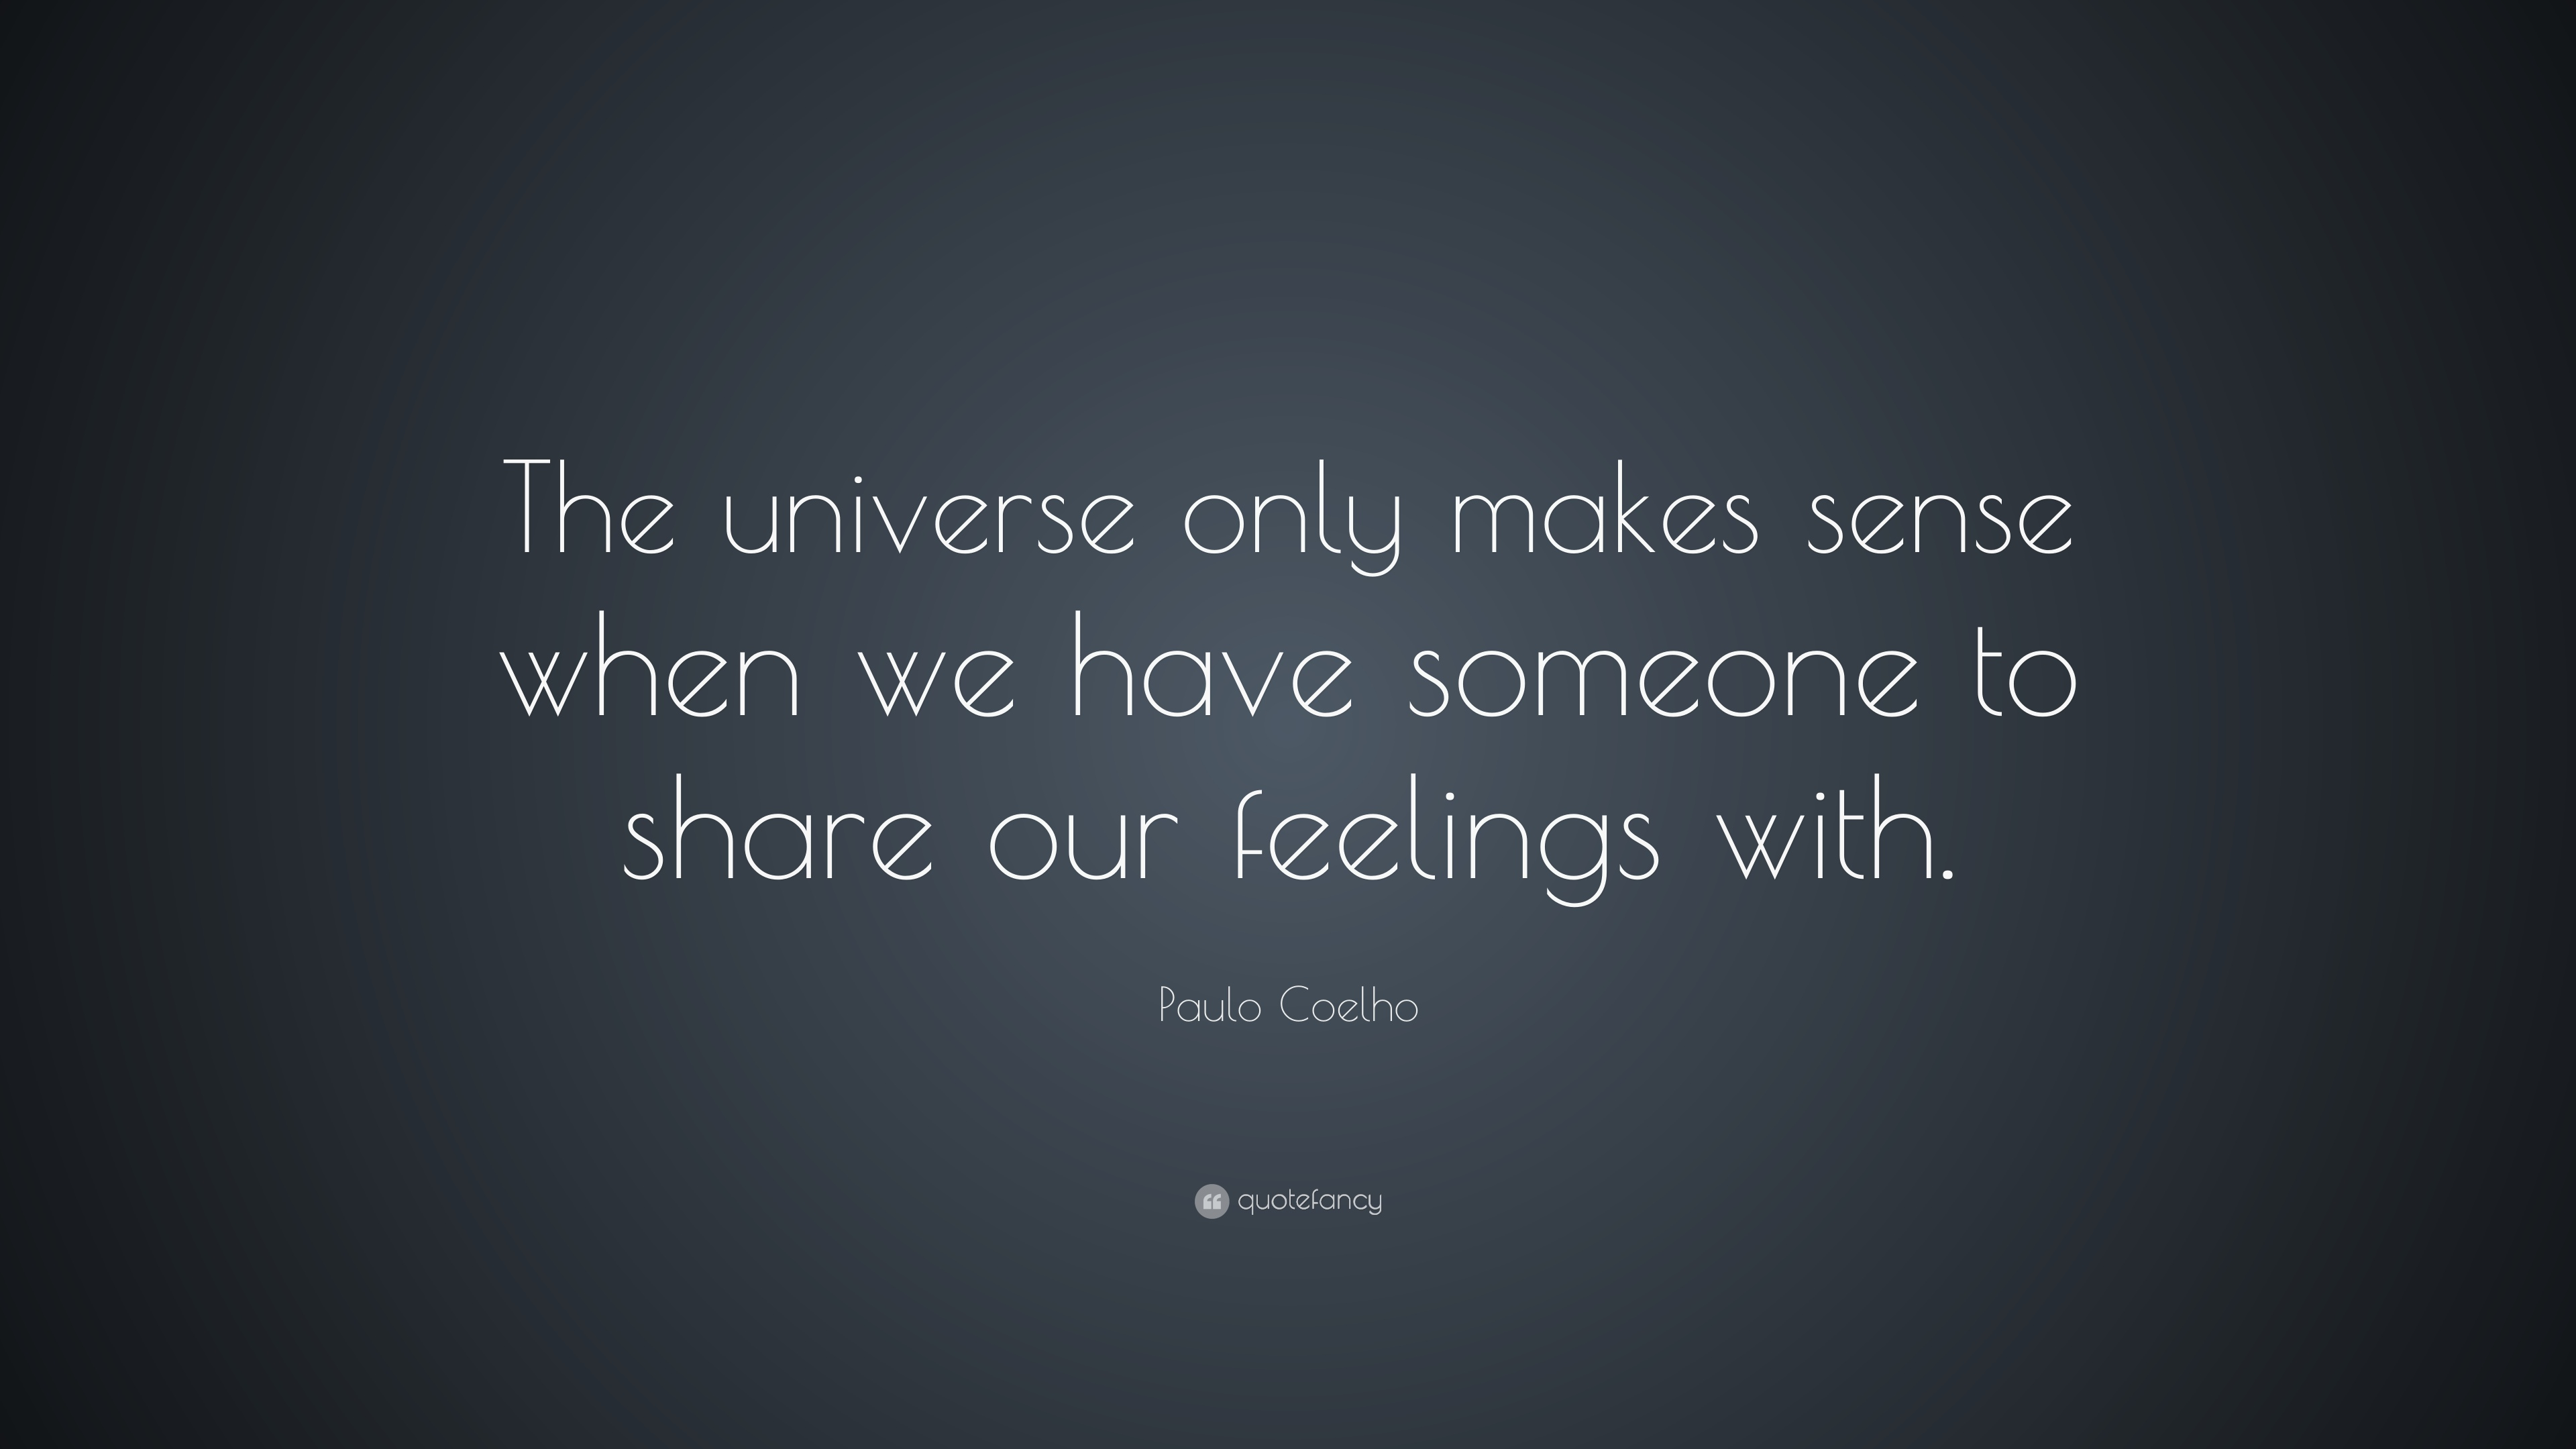 Paulo Coelho Quotes About Destiny Weisheiten Dalai Lama Zitate